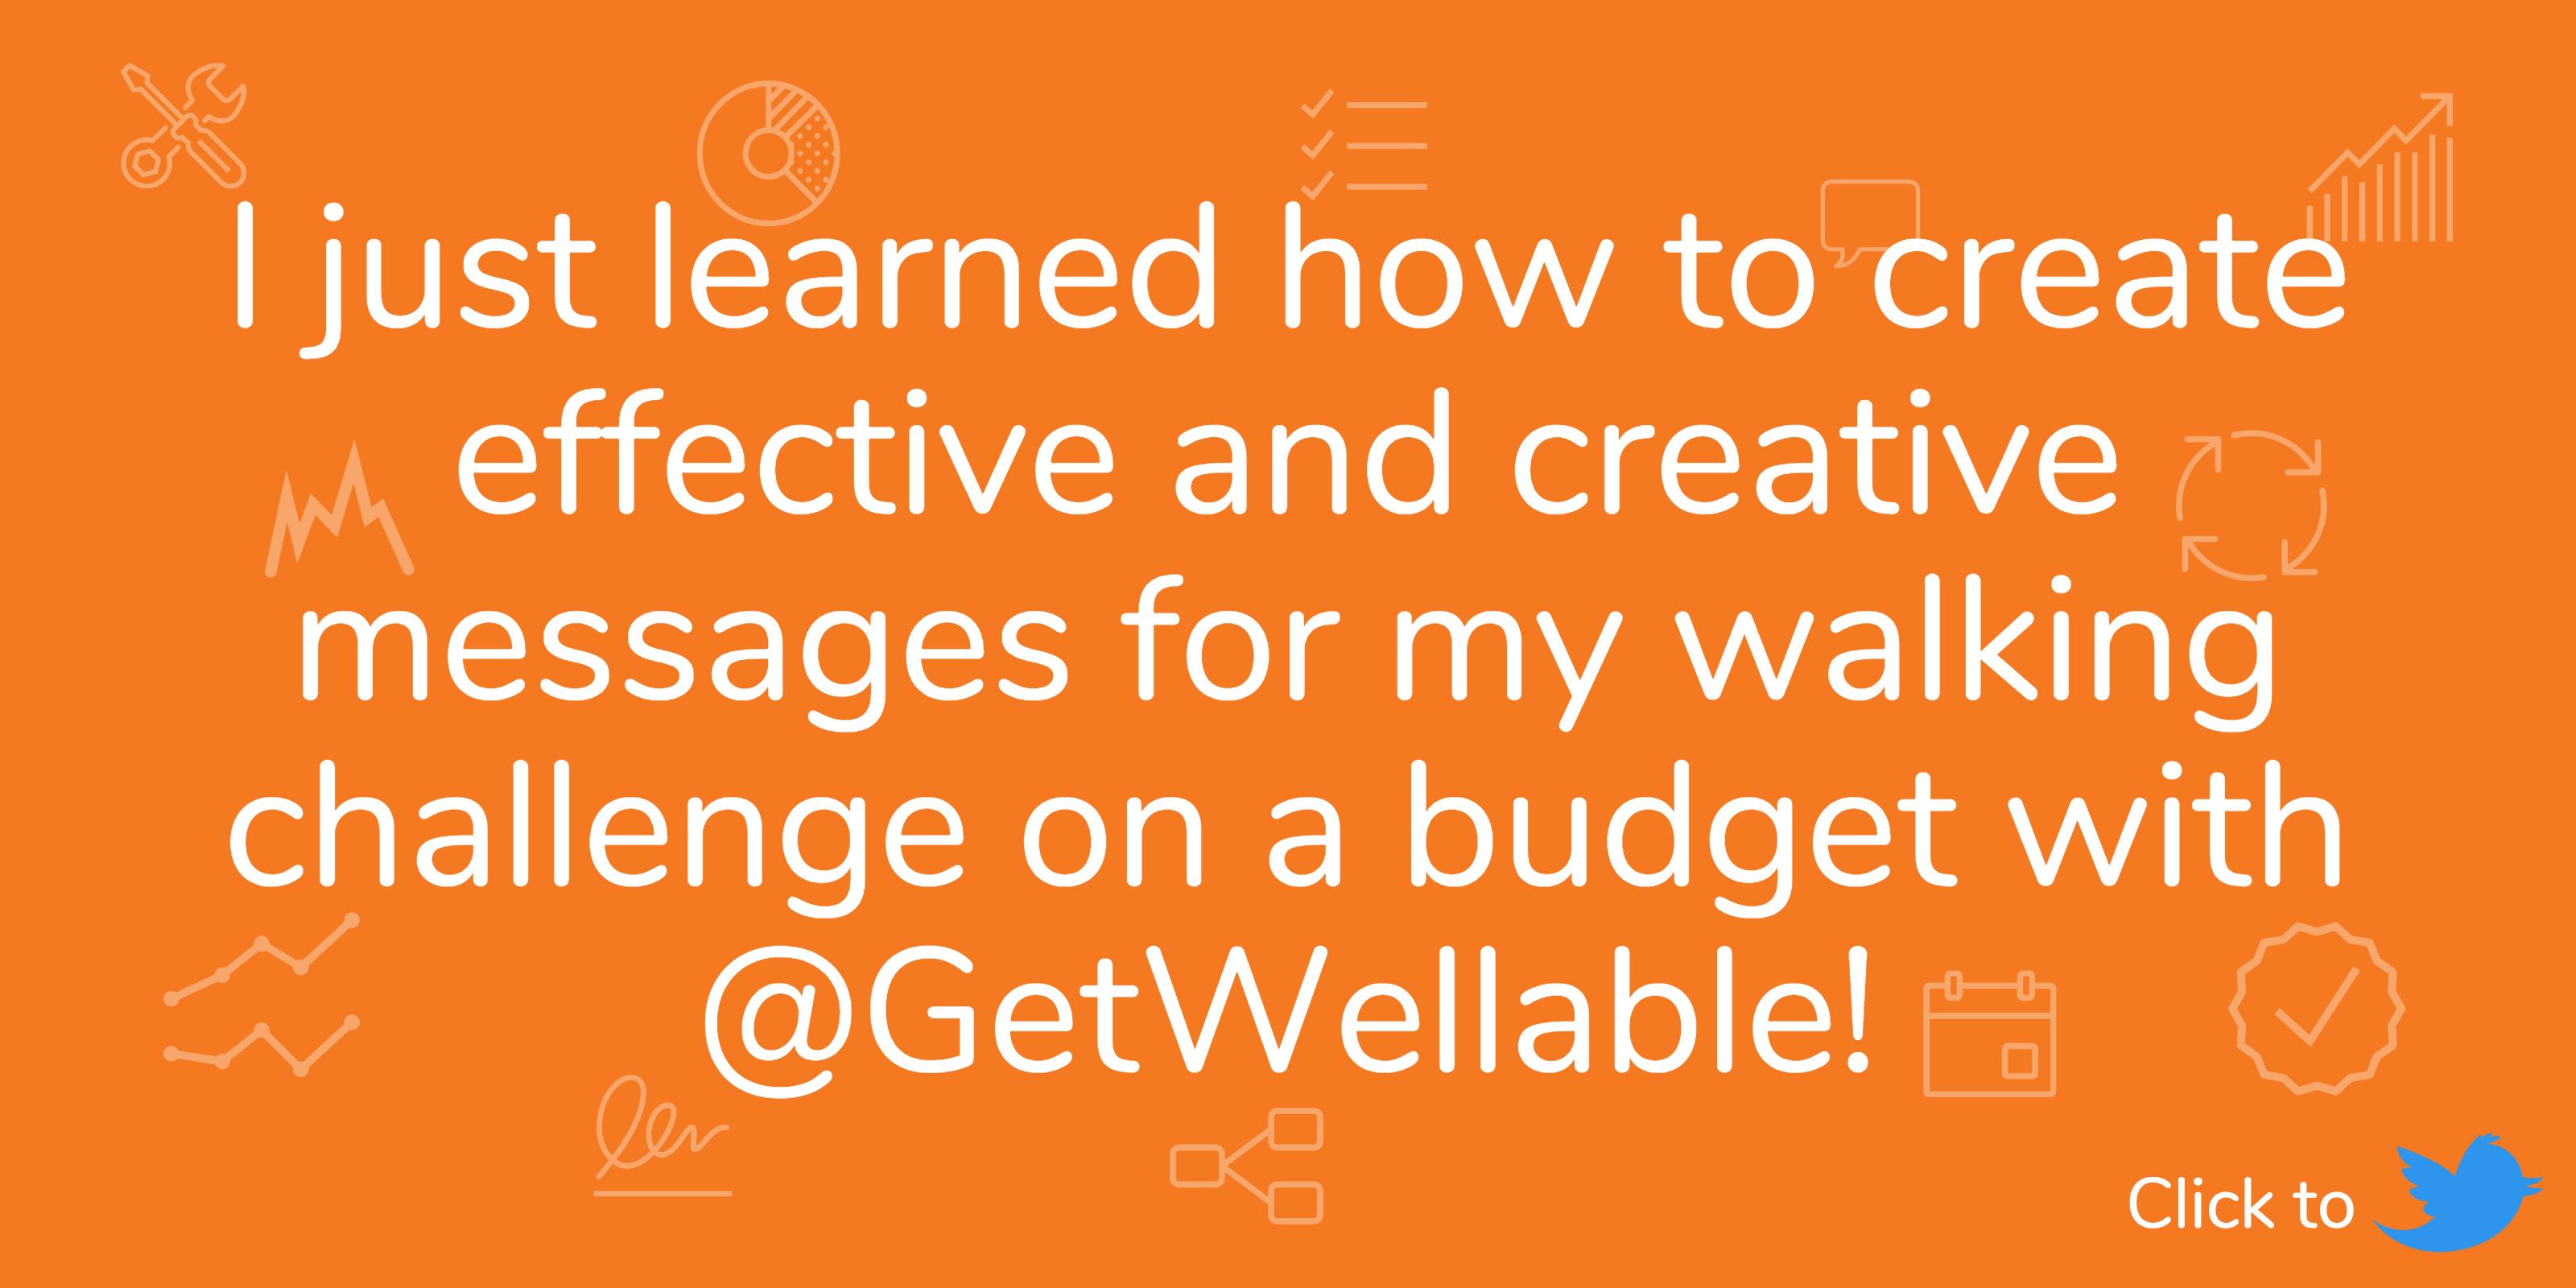 wellness challenge on a budget